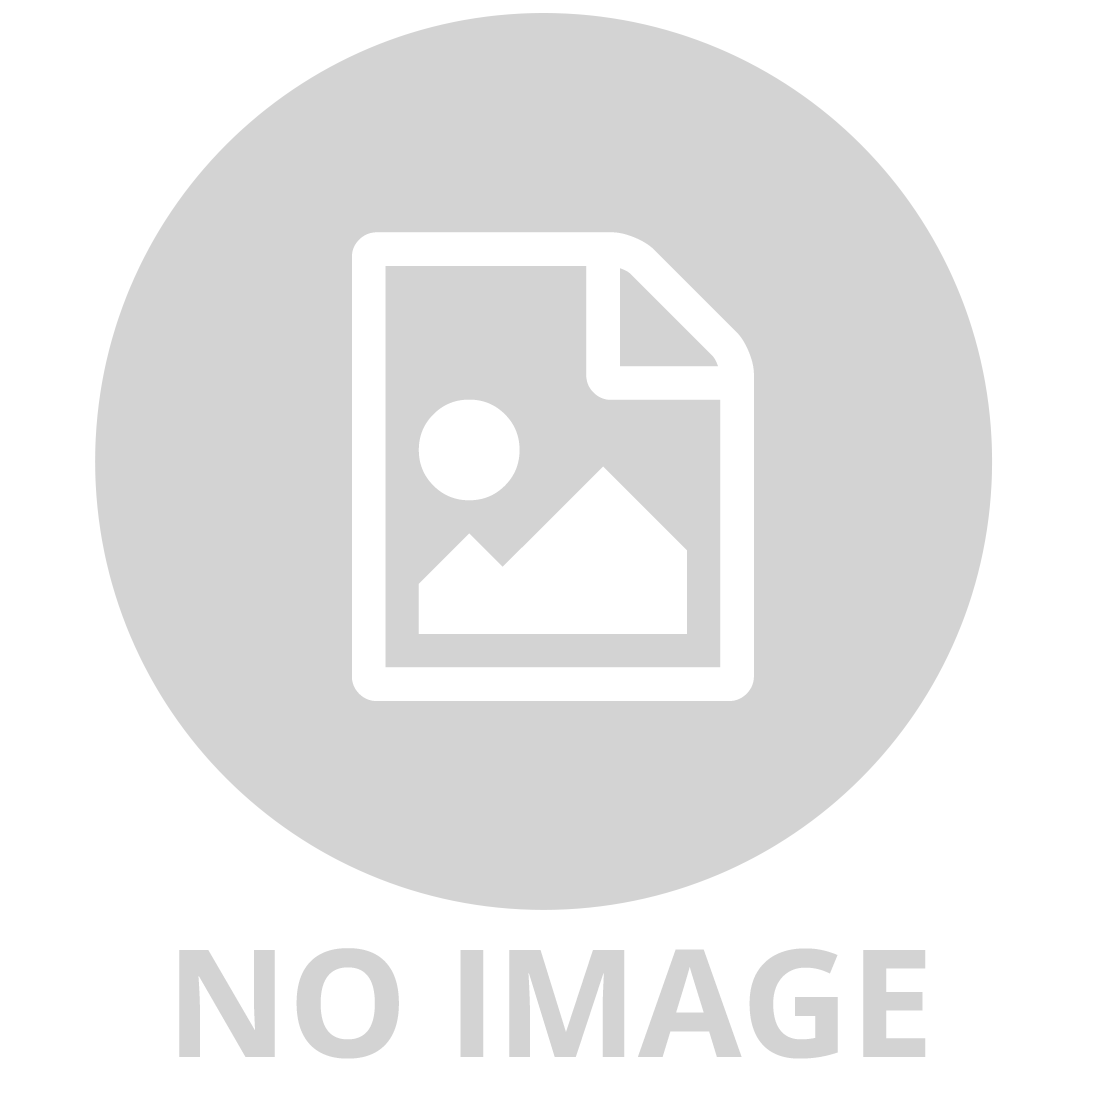 TAMIYA ACRYLIC X 6 ORANGE GLOSS